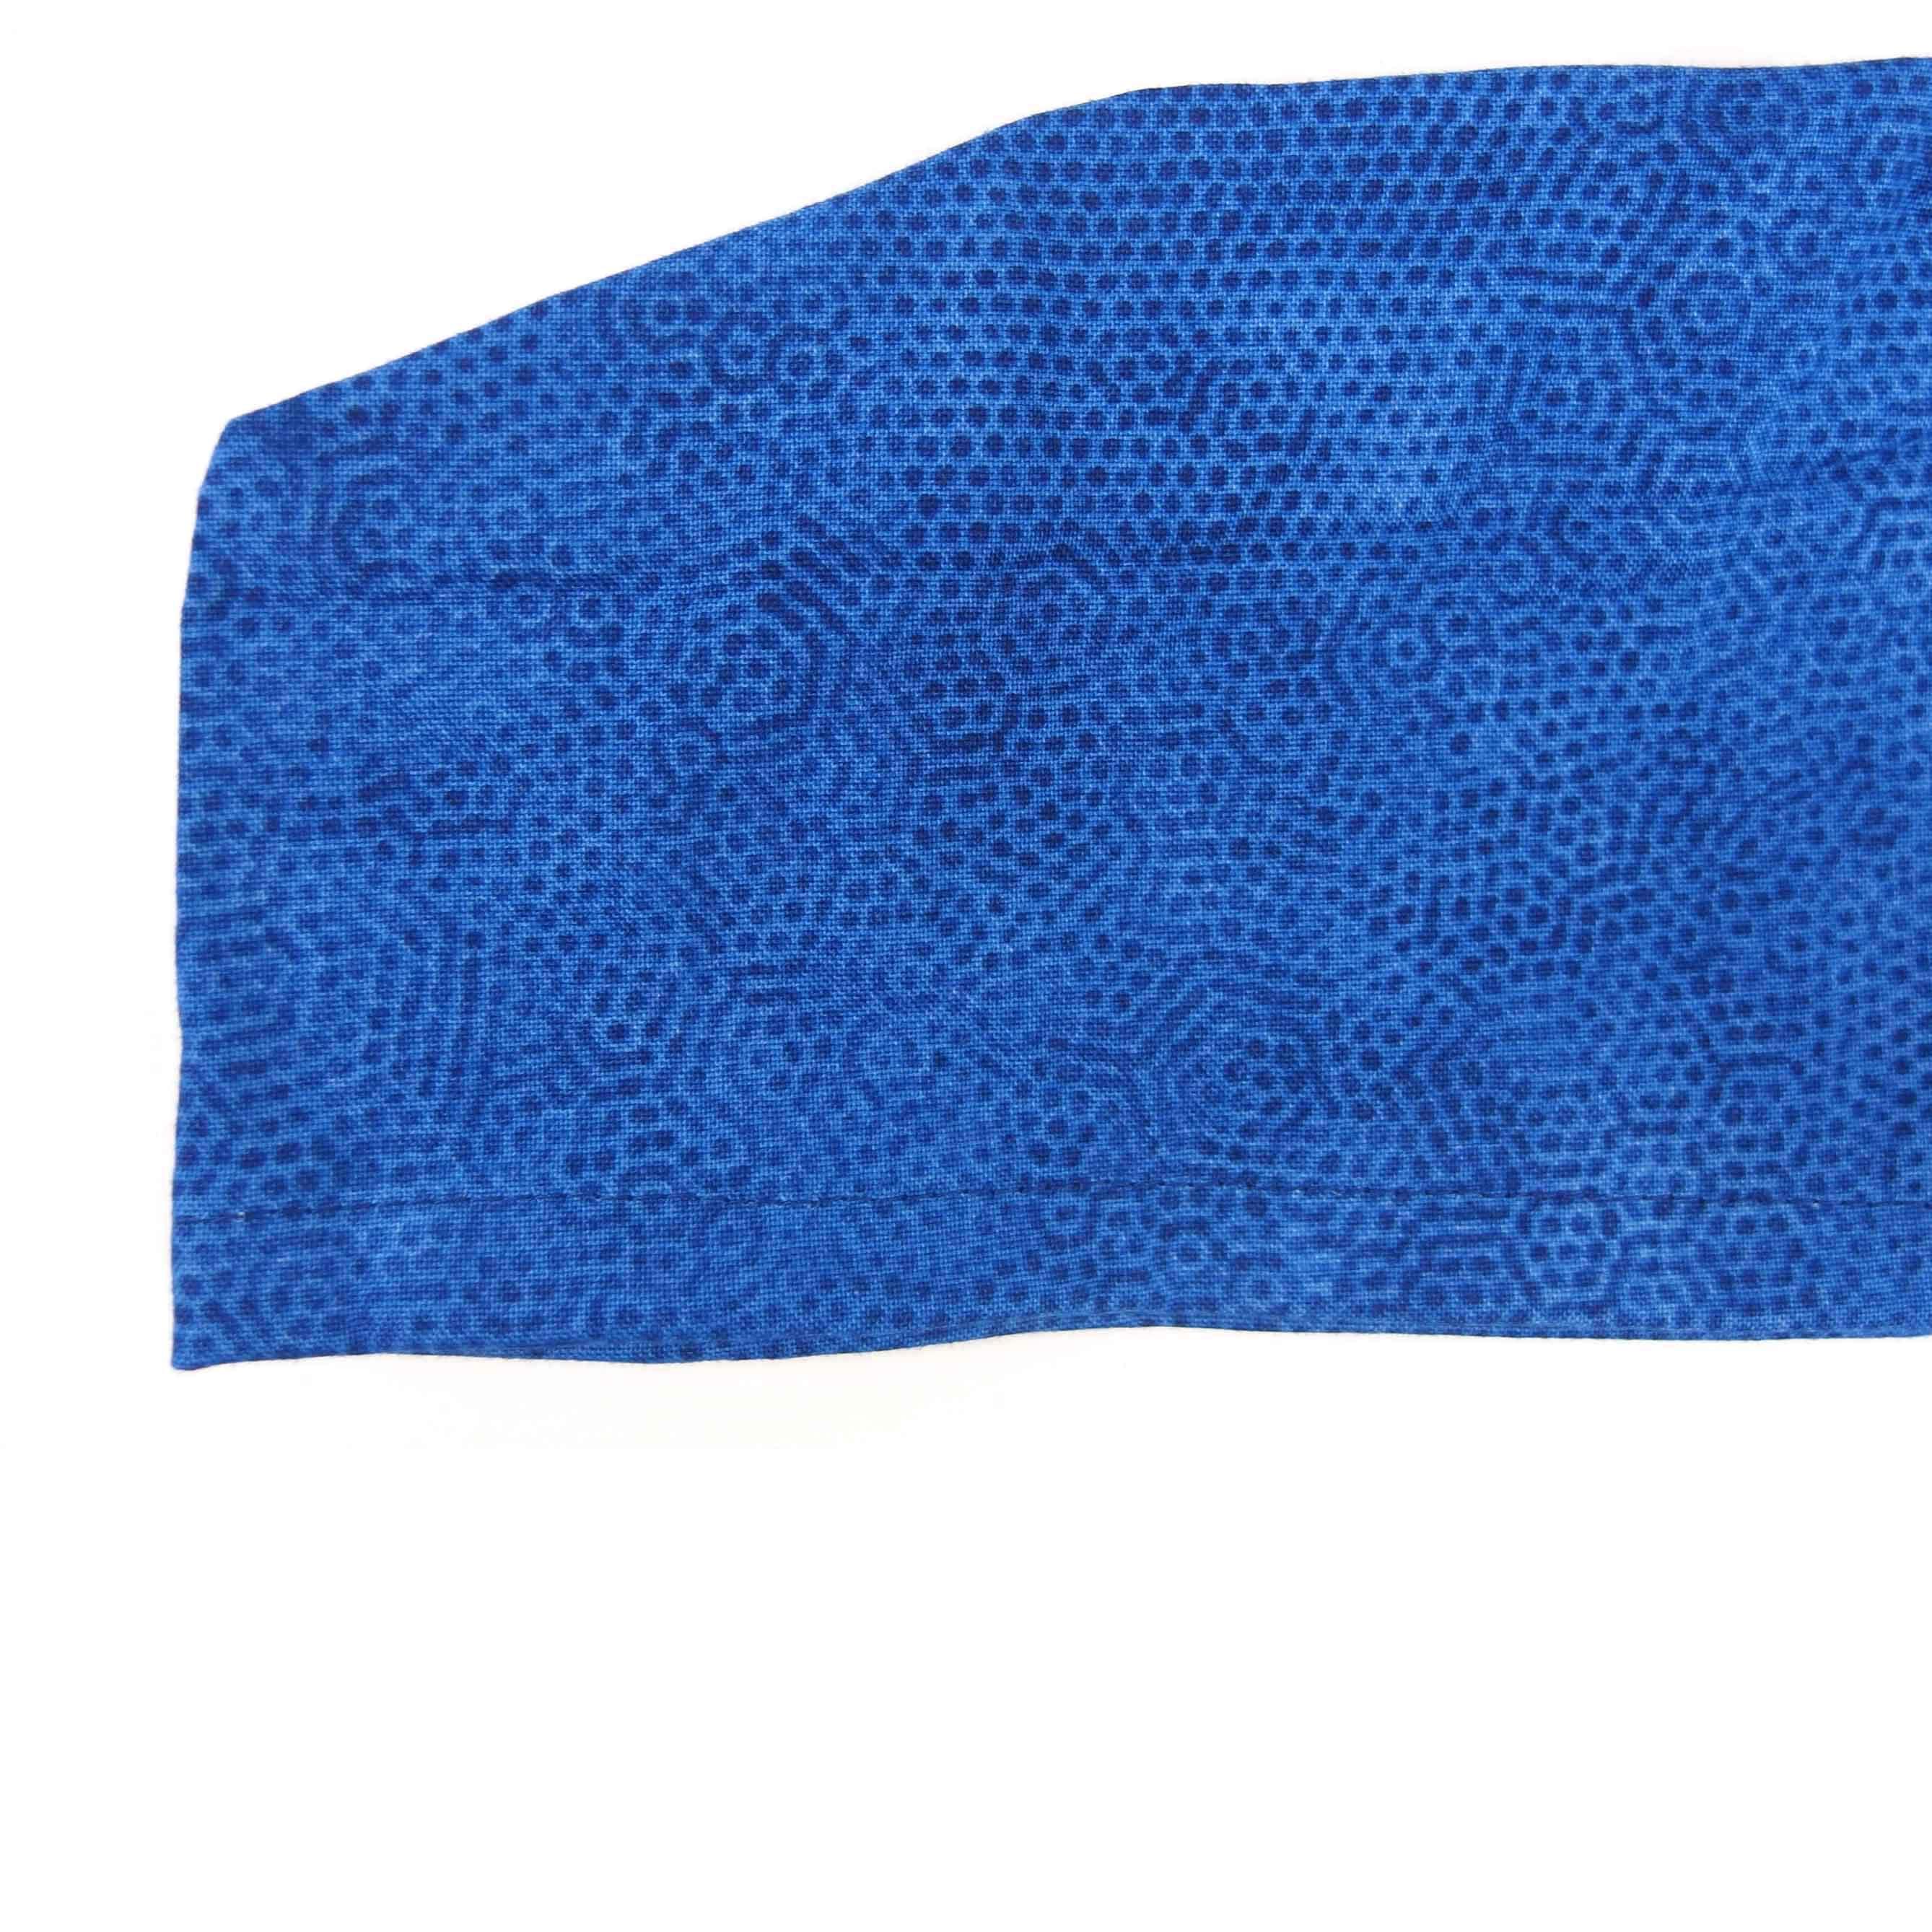 153 Raster blau